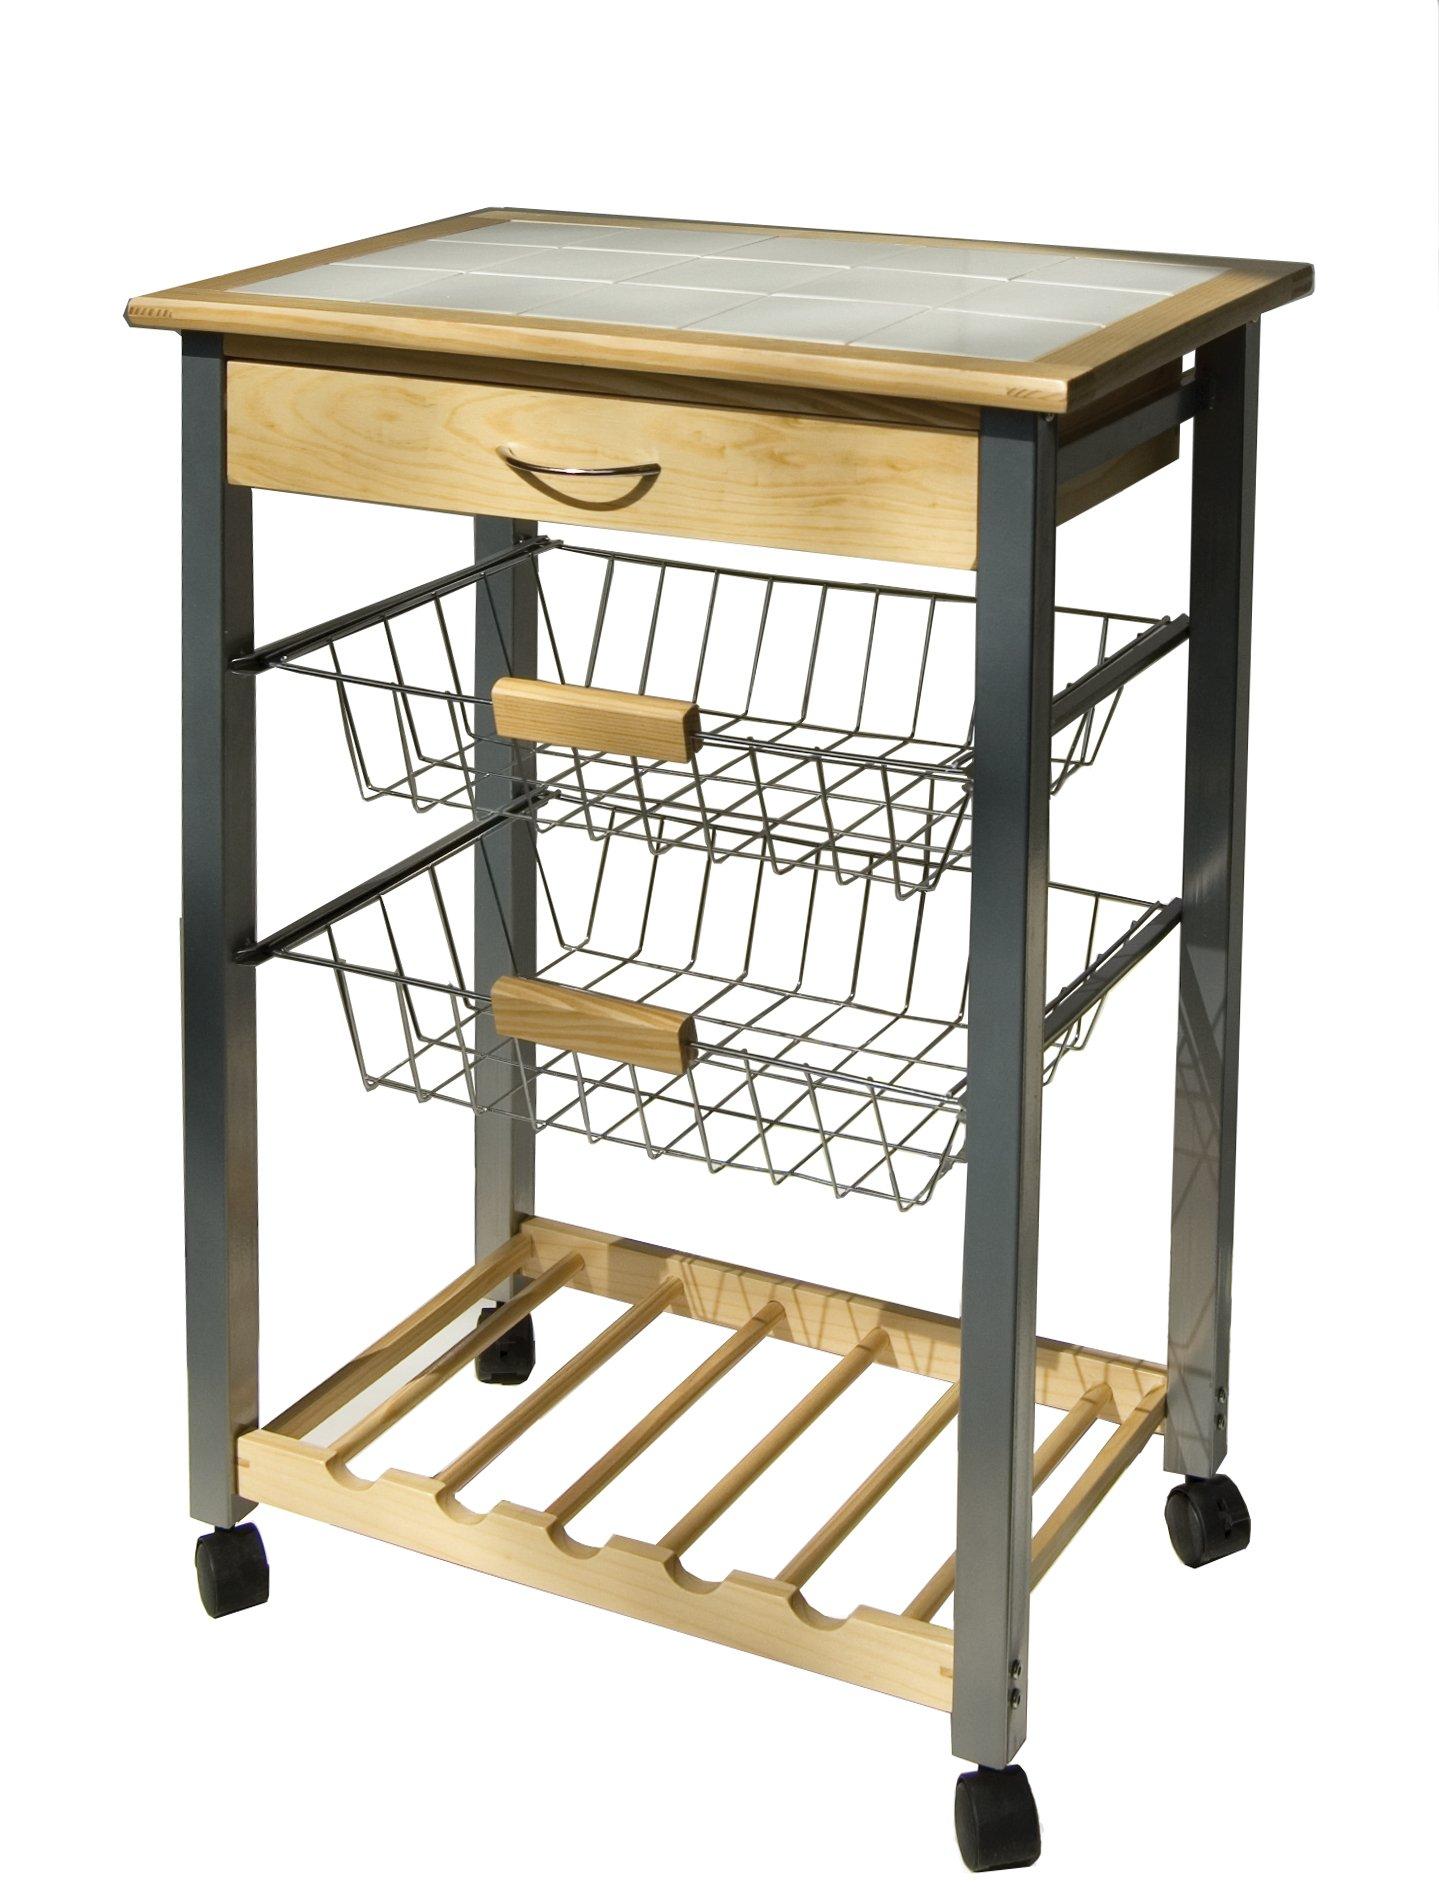 Organize It All 34122W-1 Serving Cart, Tan, White, Black, Silver by Organize It All